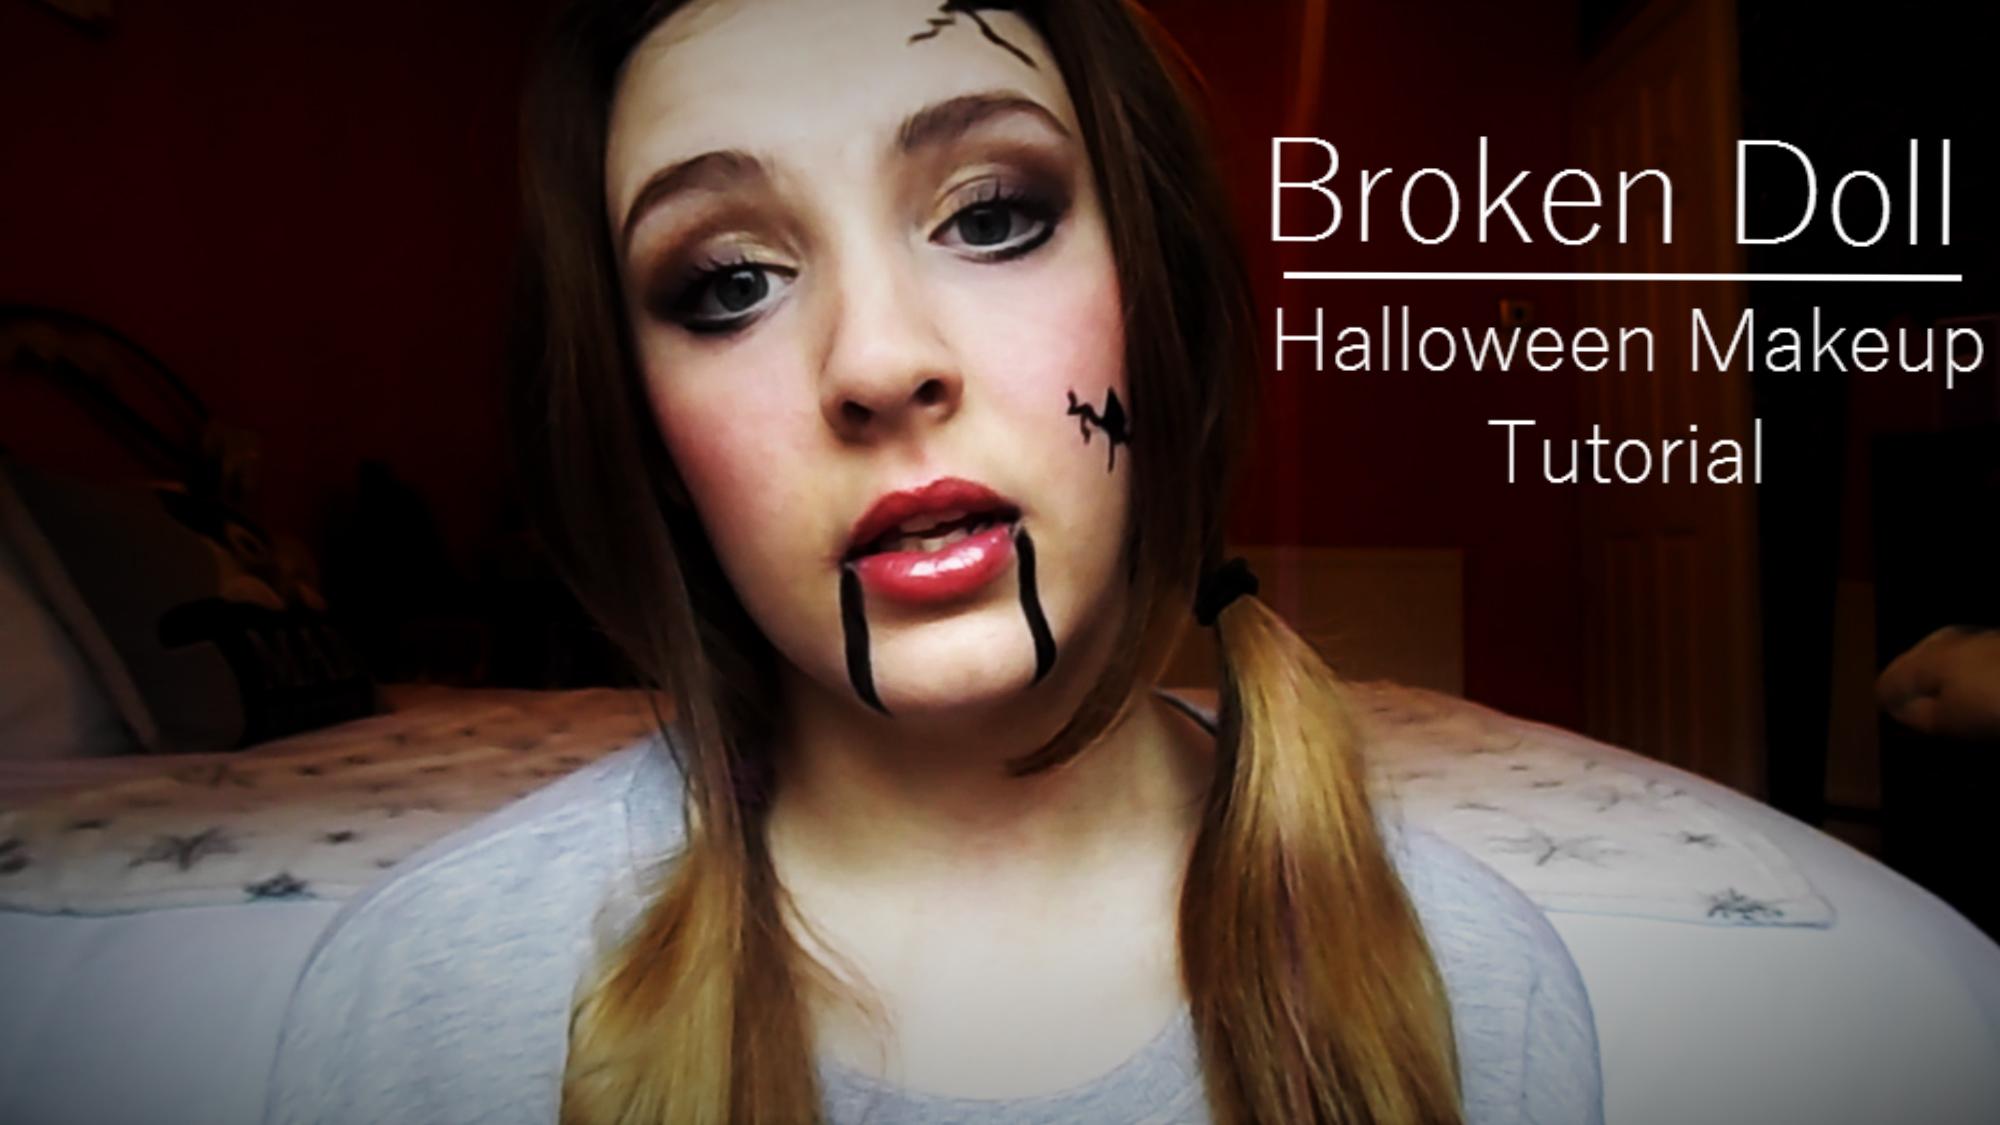 Broken doll halloween makeup tutorial organic by nerve broken doll halloween makeup tutorial baditri Image collections